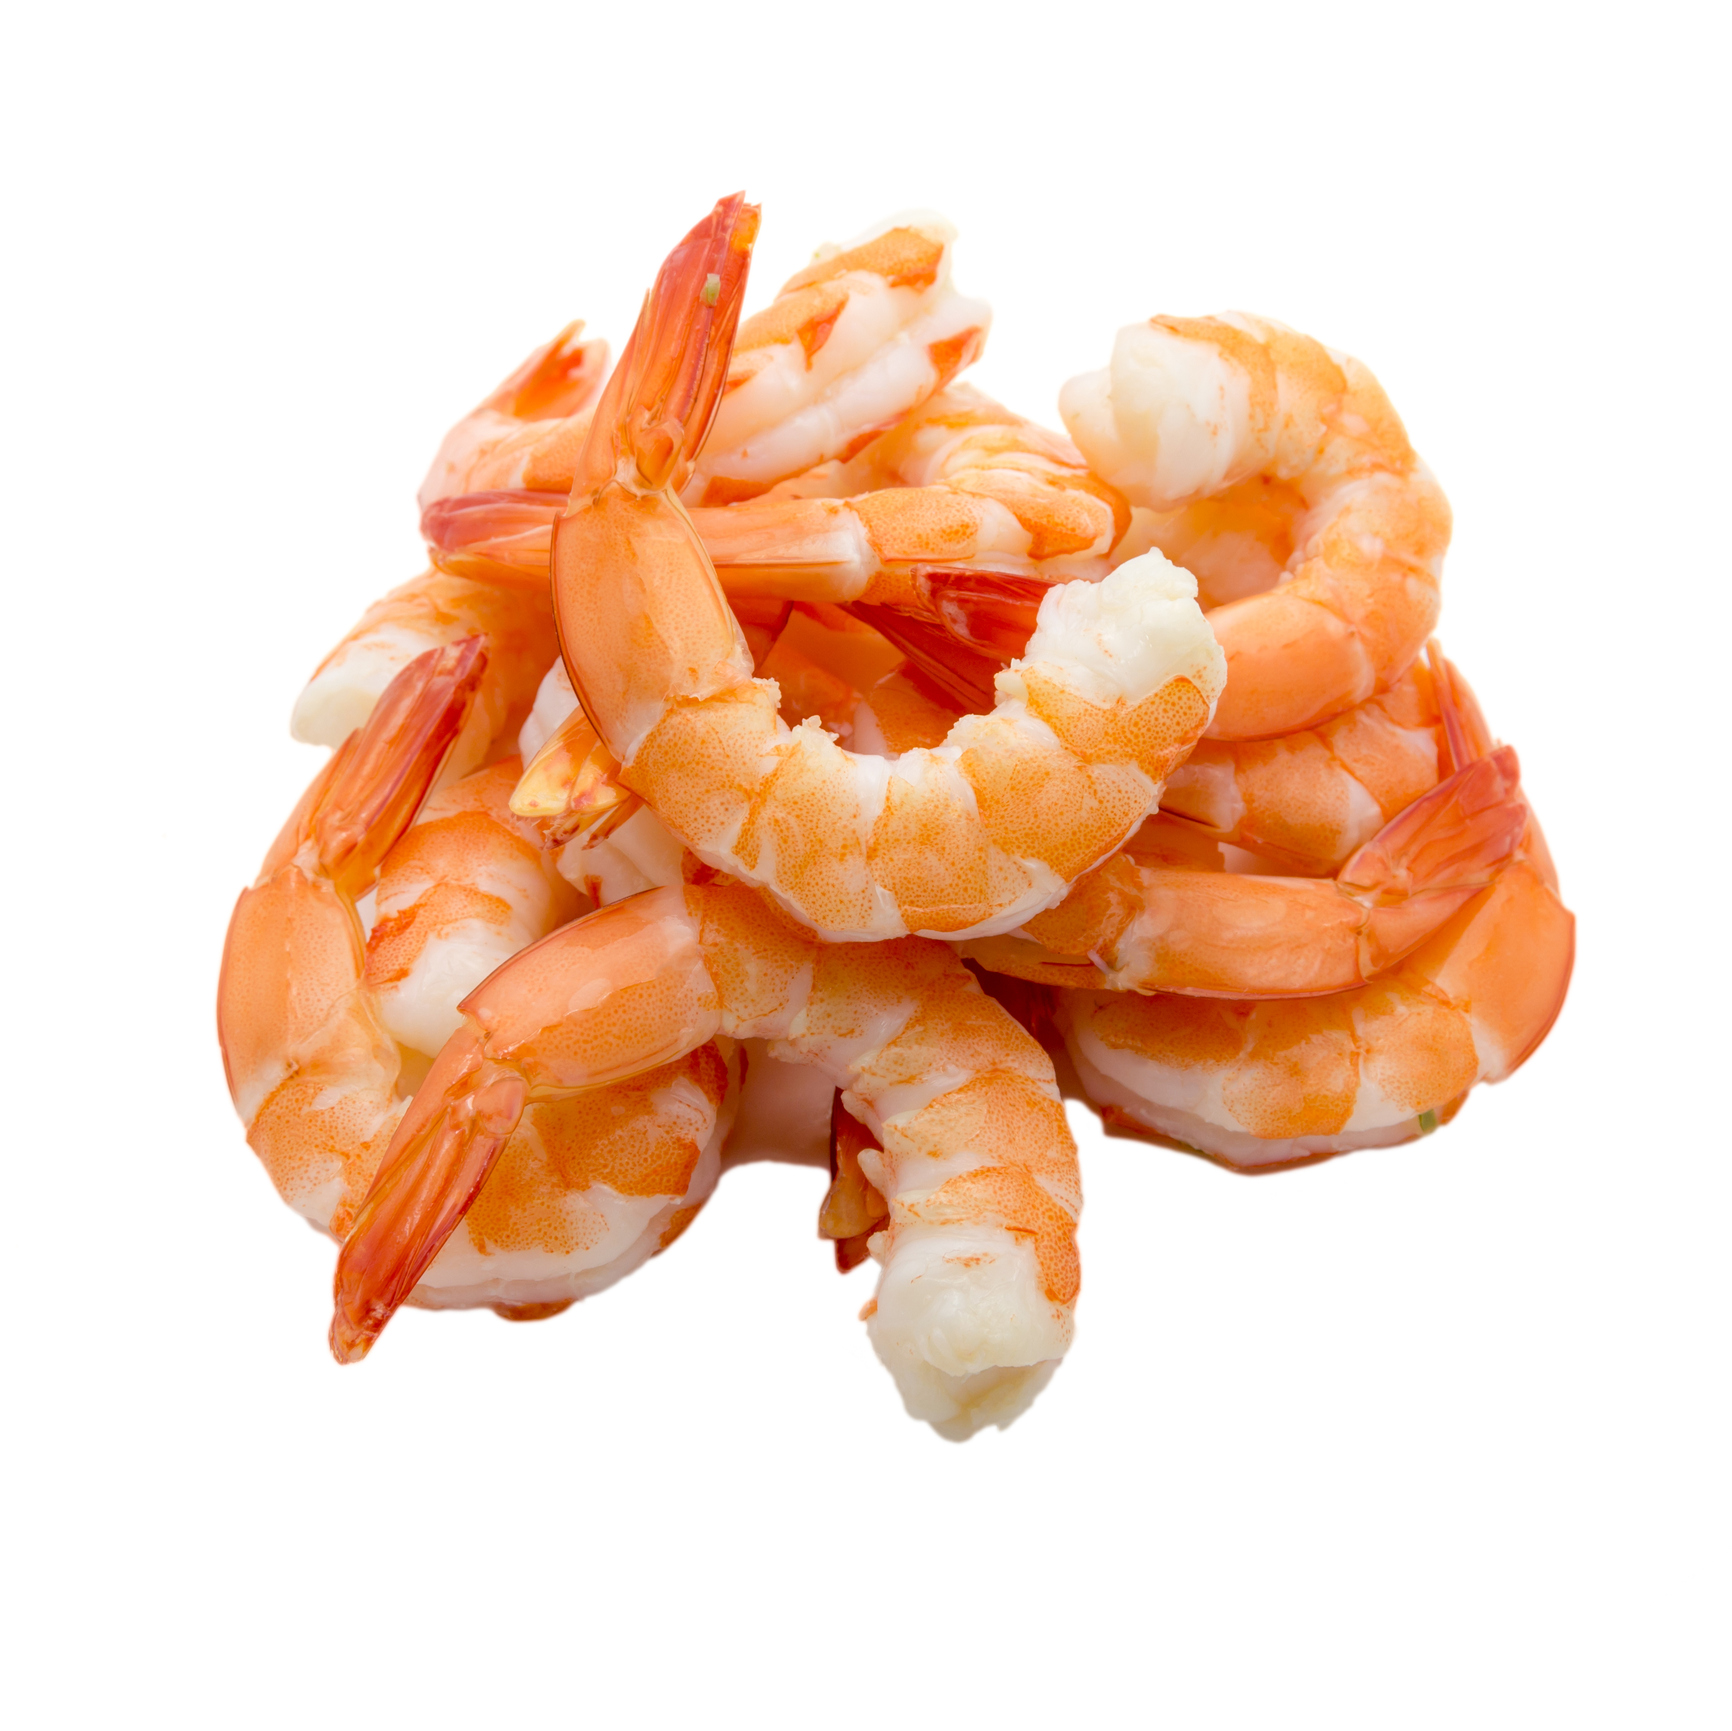 getty-shrimp-image